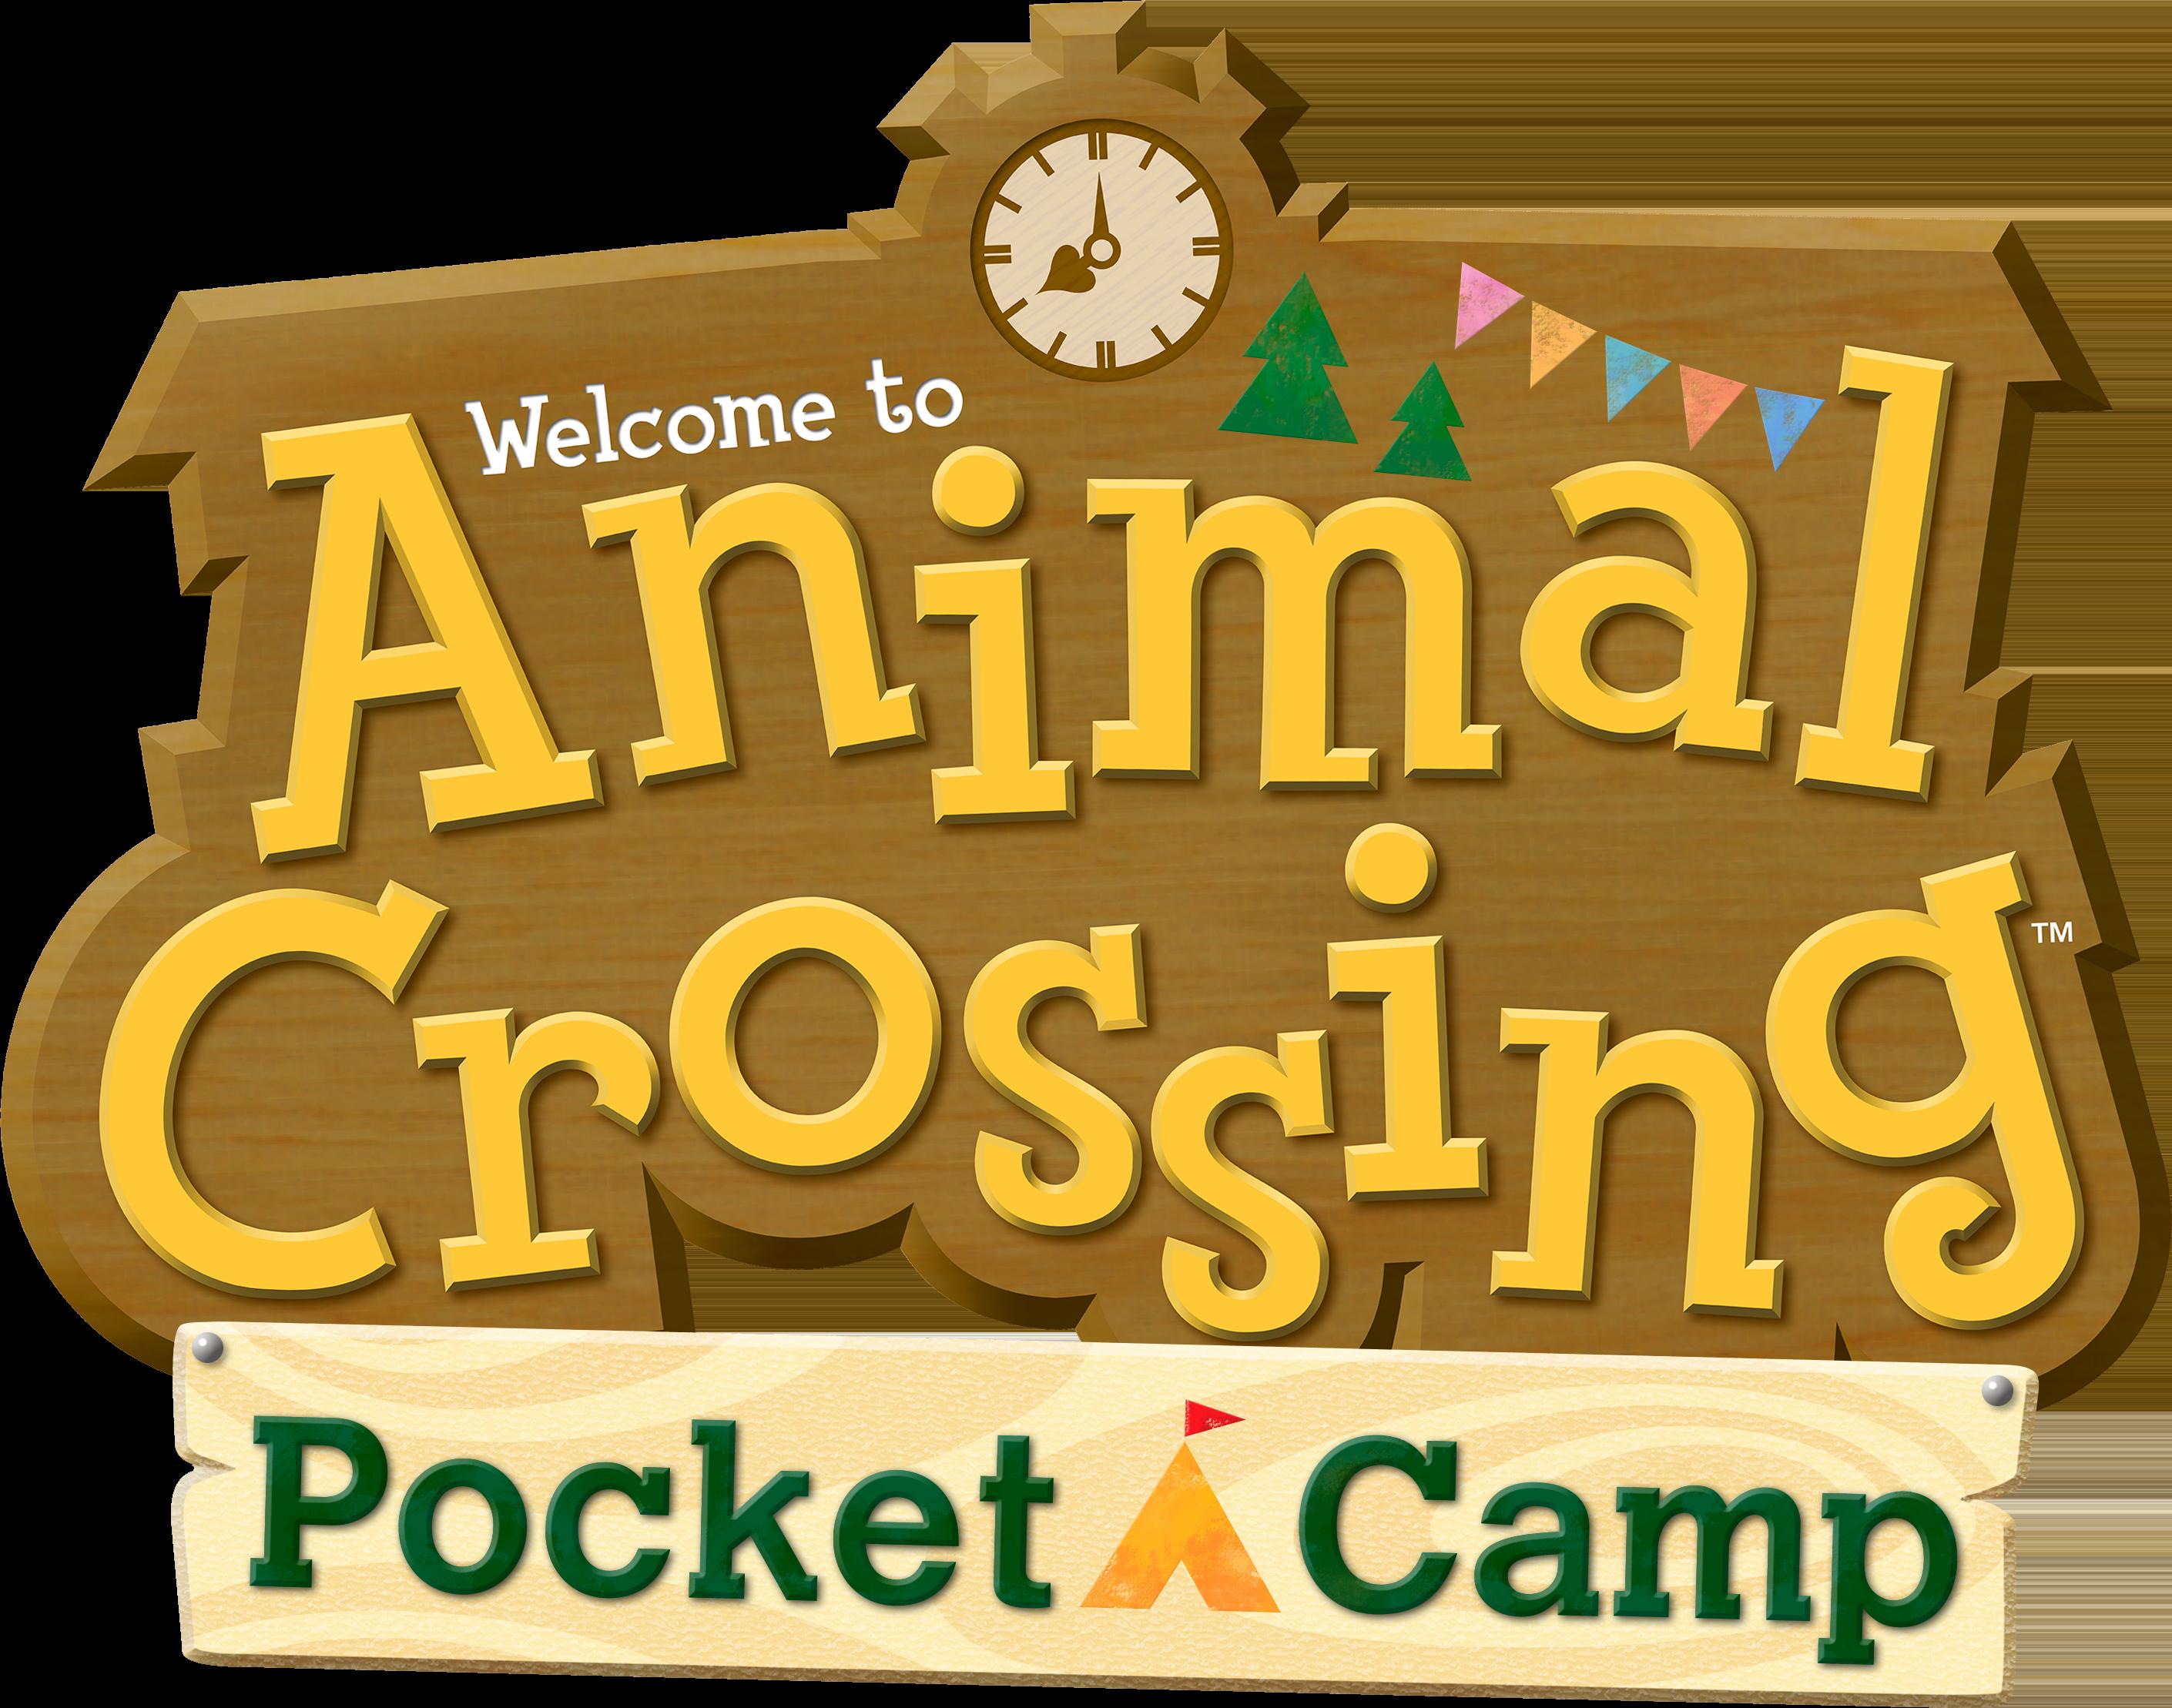 Clipart tent shanty. Animal crossing pocket camp